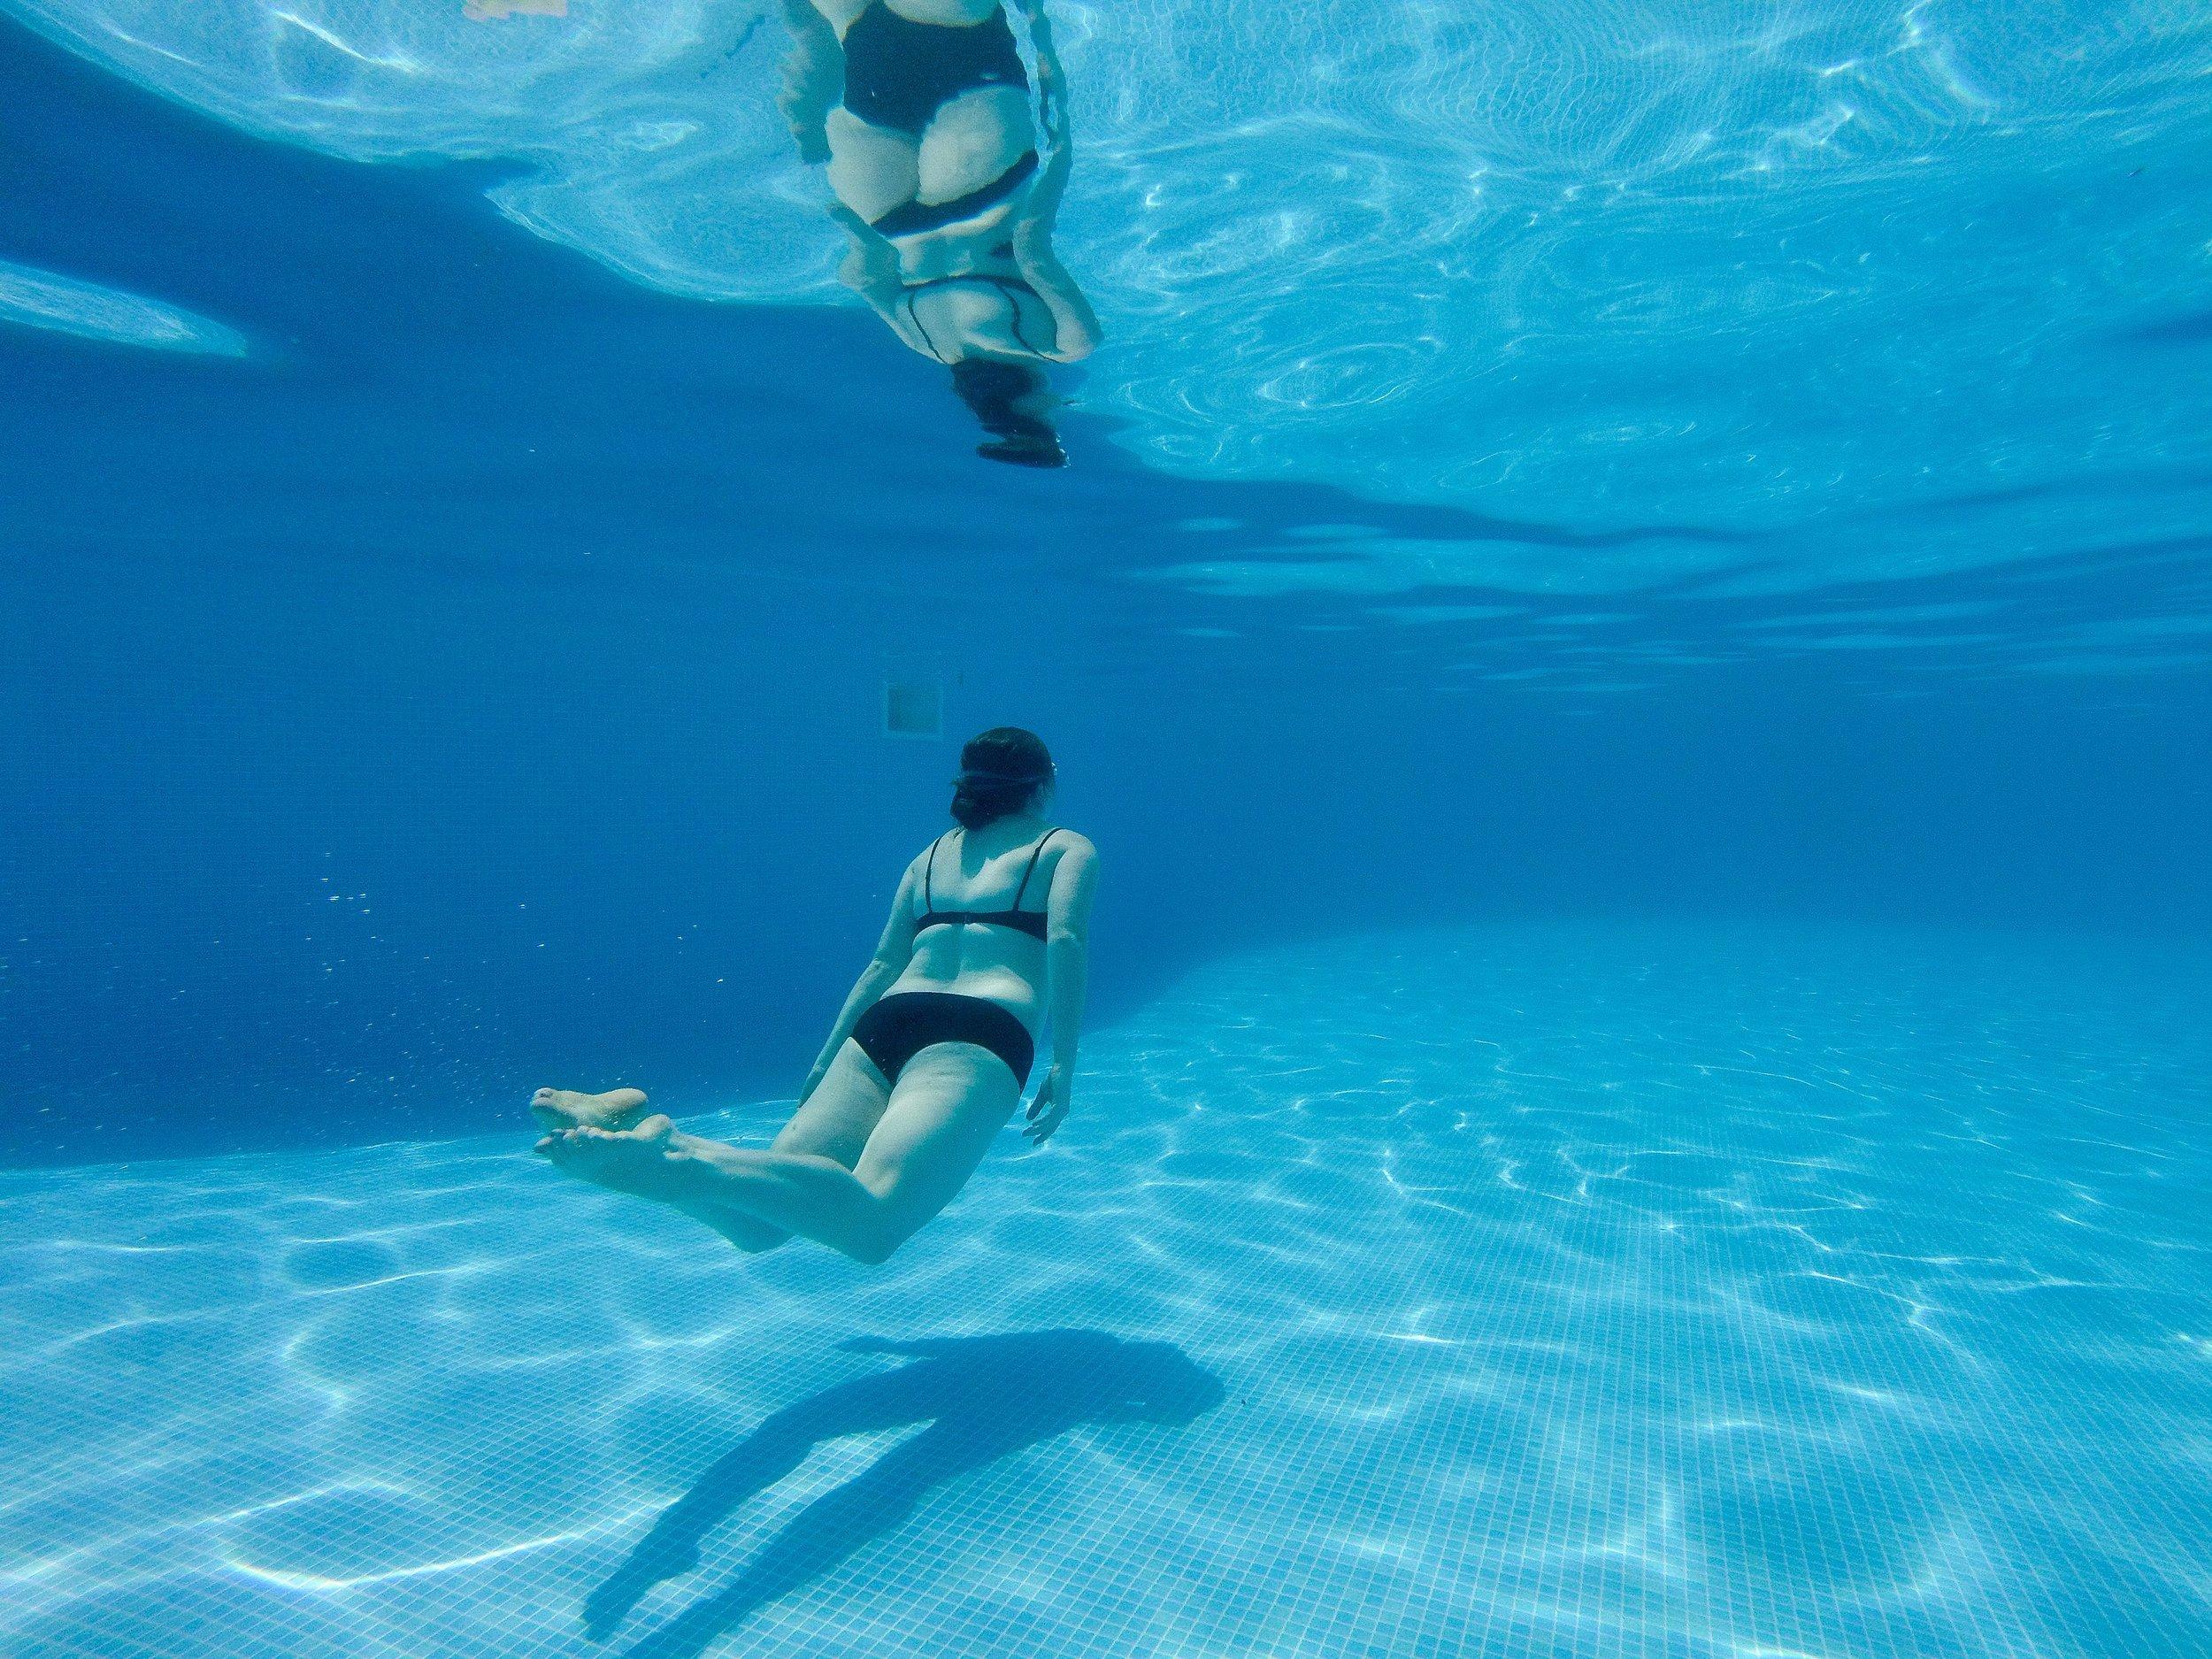 Eco Friendly Swimwear - A Pretty Place to Play